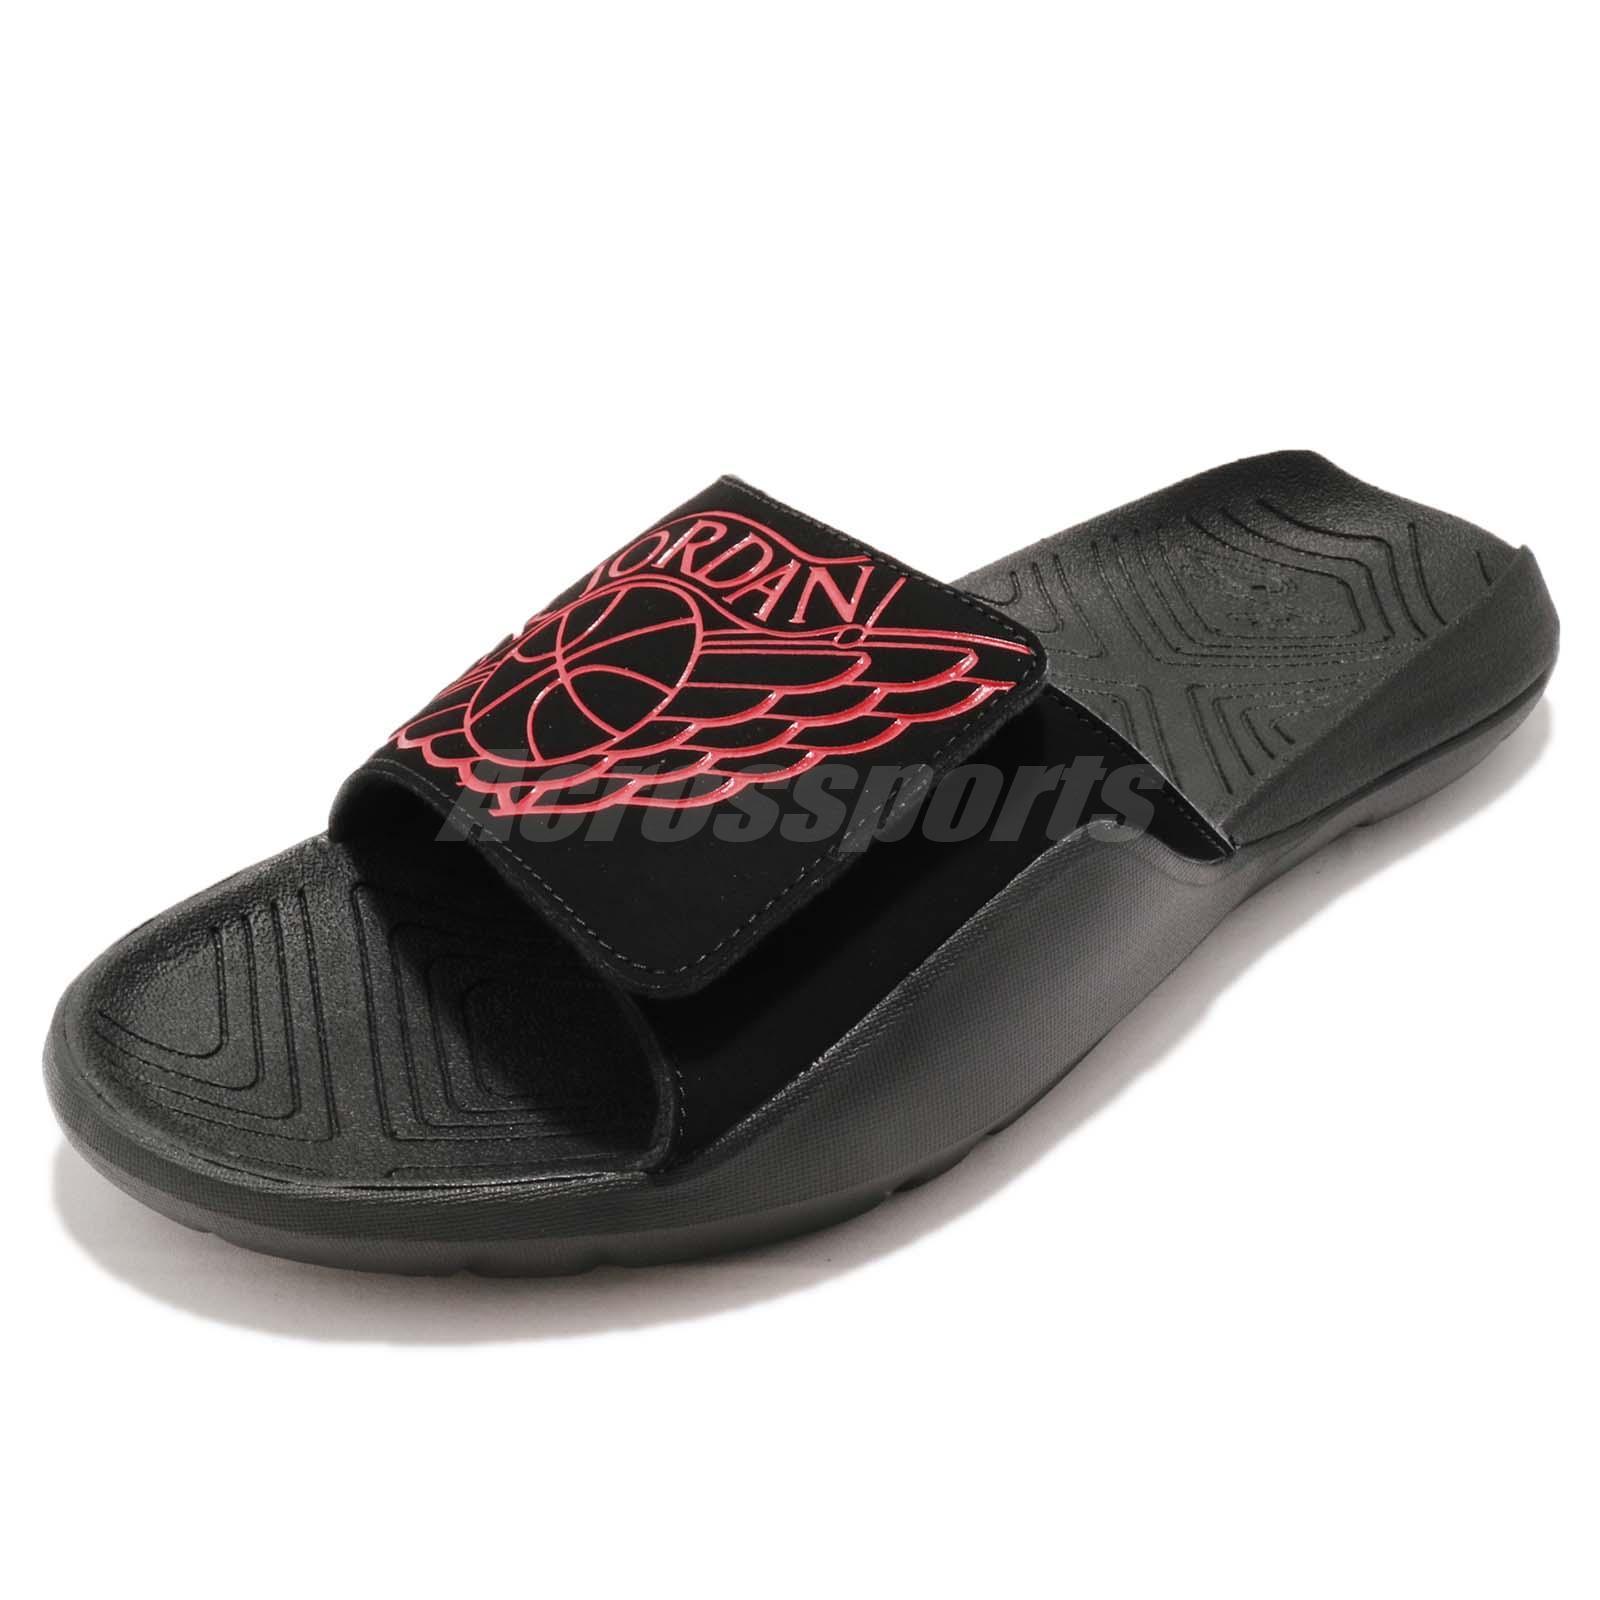 Nike Jordan Hydro 7 VII Black Red Men Sports Sandals Slides Slippers  AA2517-062 e7354d577b